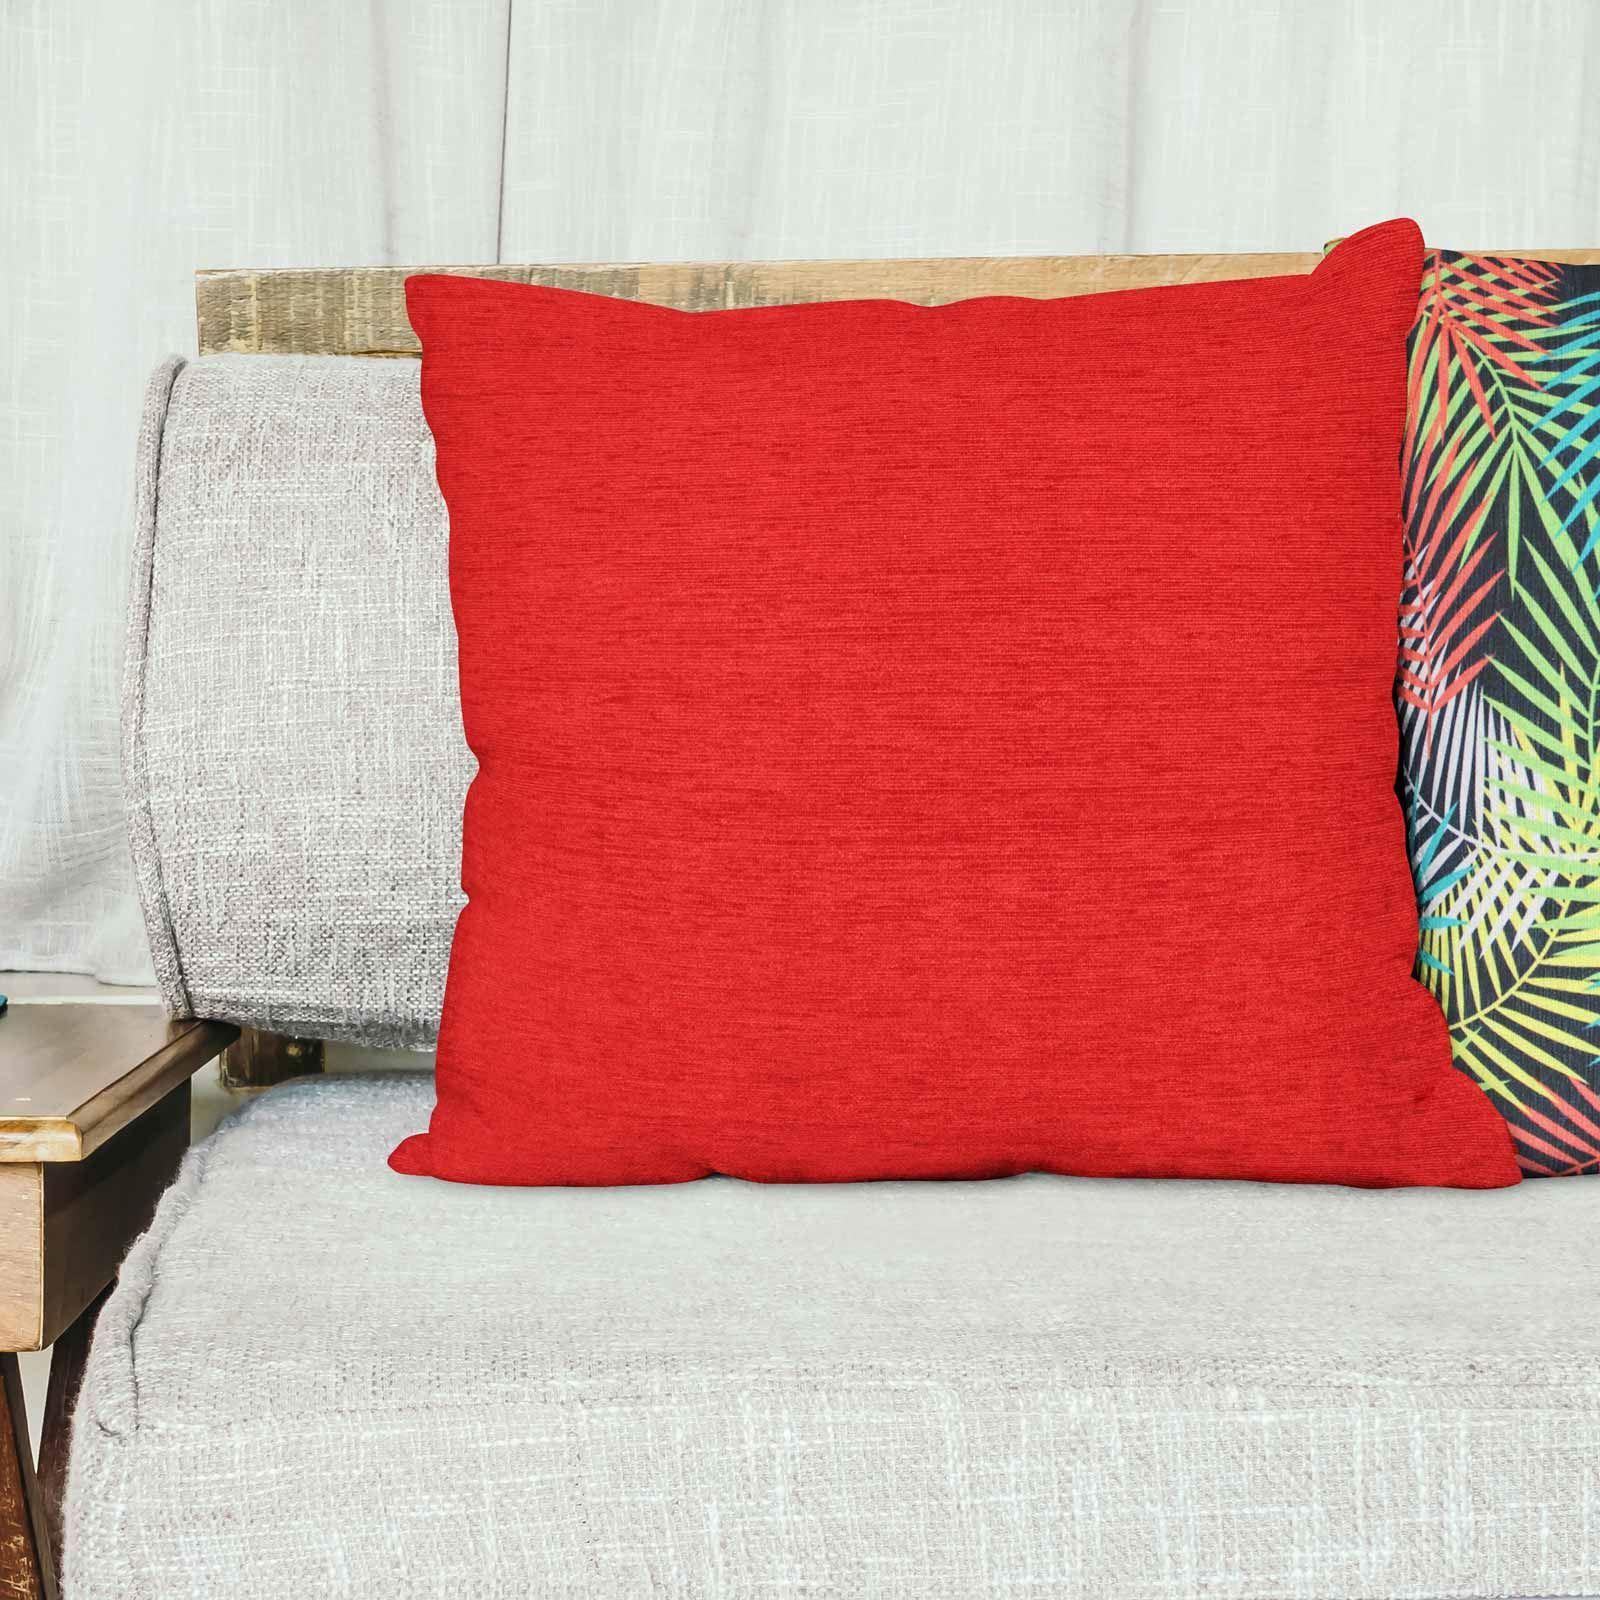 Vino-Tinto-Cushion-Covers-Coleccion-17-034-18-034-43cm-45cm-Cubierta miniatura 7